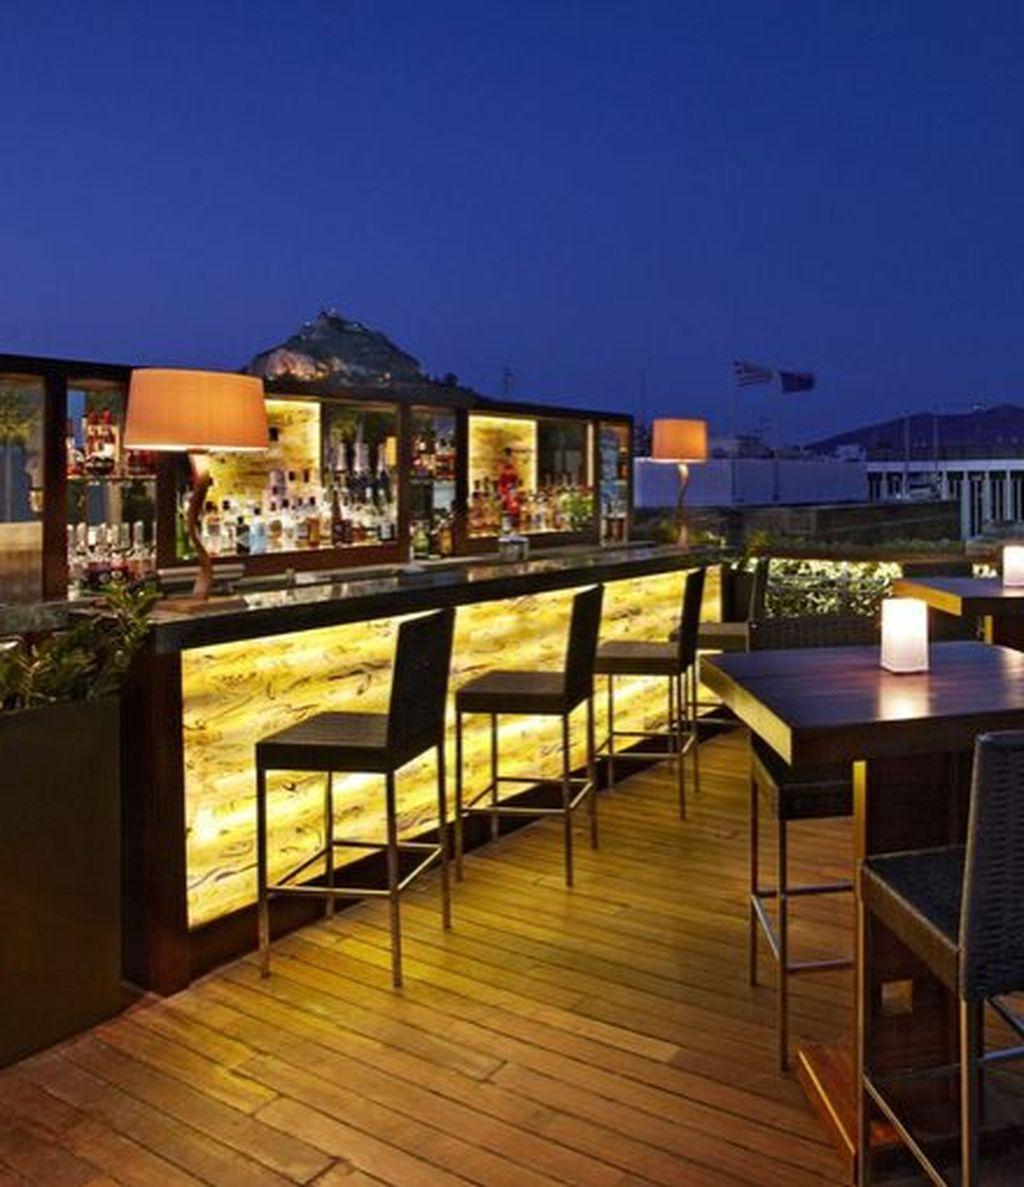 30 Stylish Roof Garden Design Ideas Trendhmdcr Rooftop Bar Design Roof Garden Design Rooftop Design